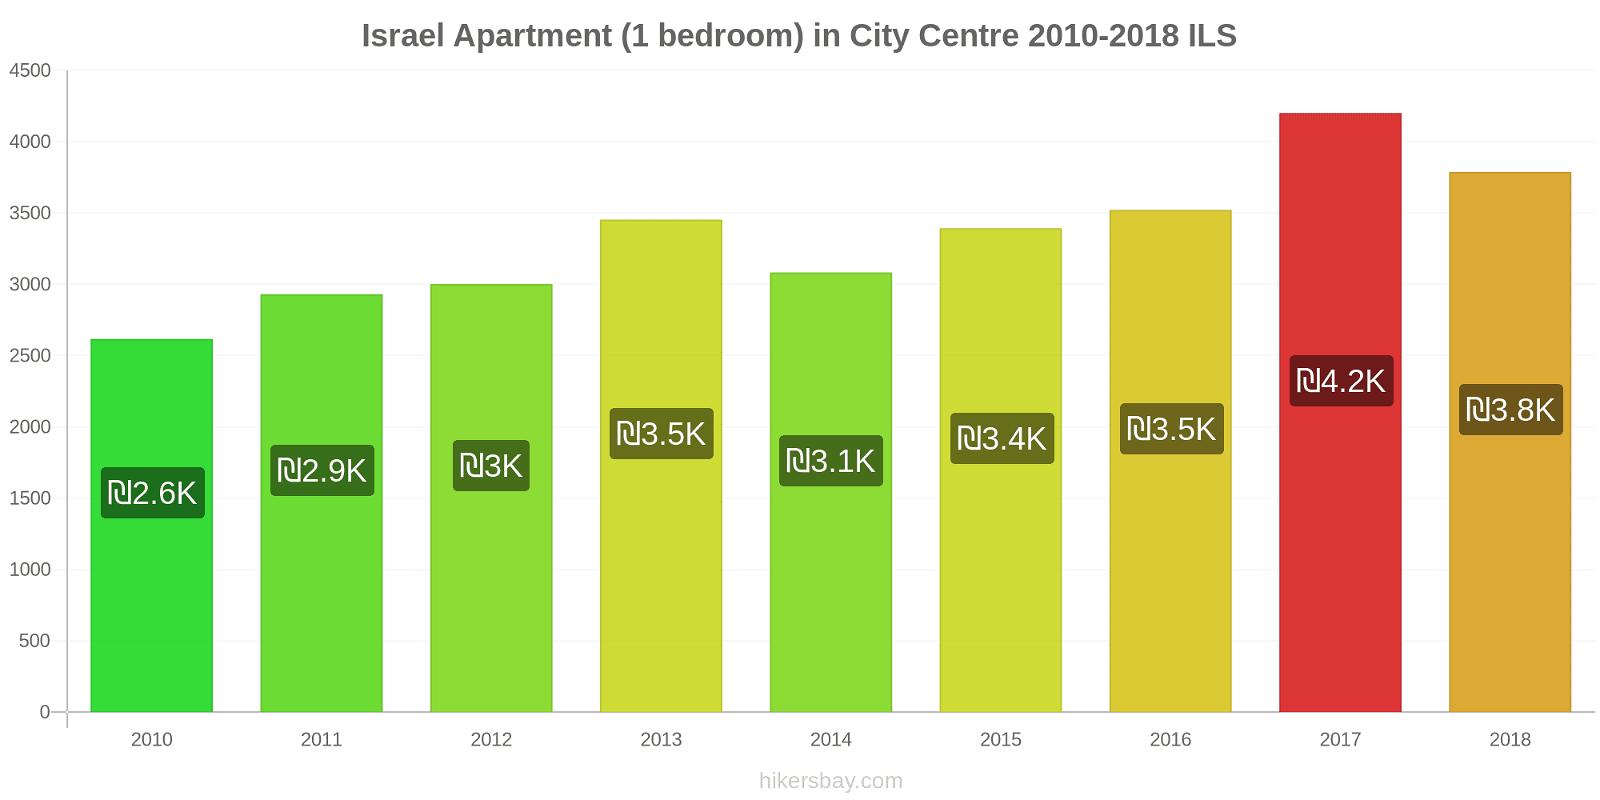 Israel price changes Apartment (1 bedroom) in City Centre hikersbay.com